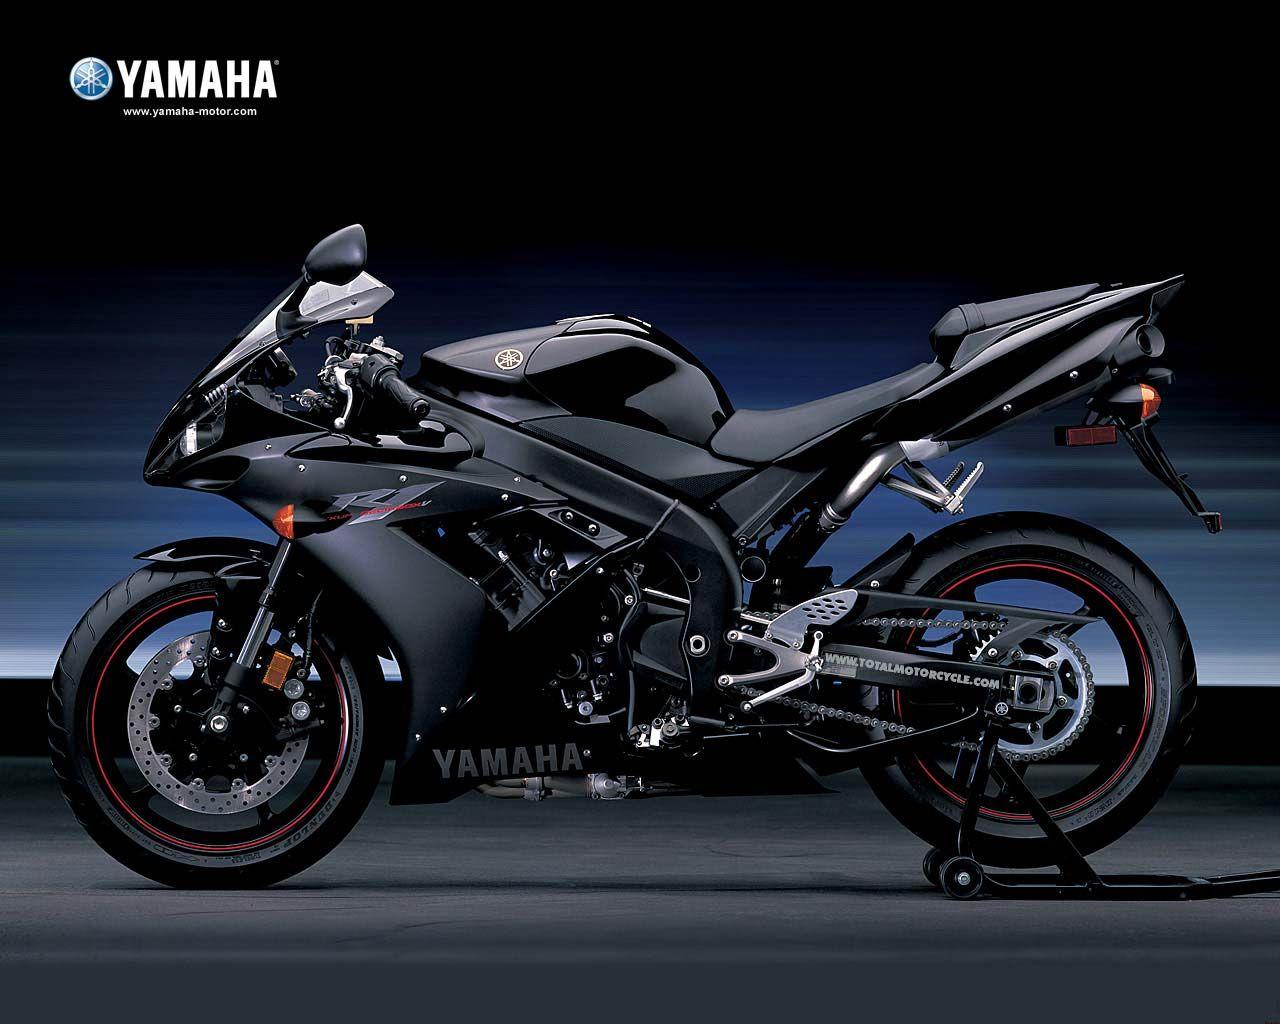 Hd background yamaha yzf r1 sport bike black and gold wallpaper - Yamaha R6 Wallpapers Yamaha Yzf R1yamaha